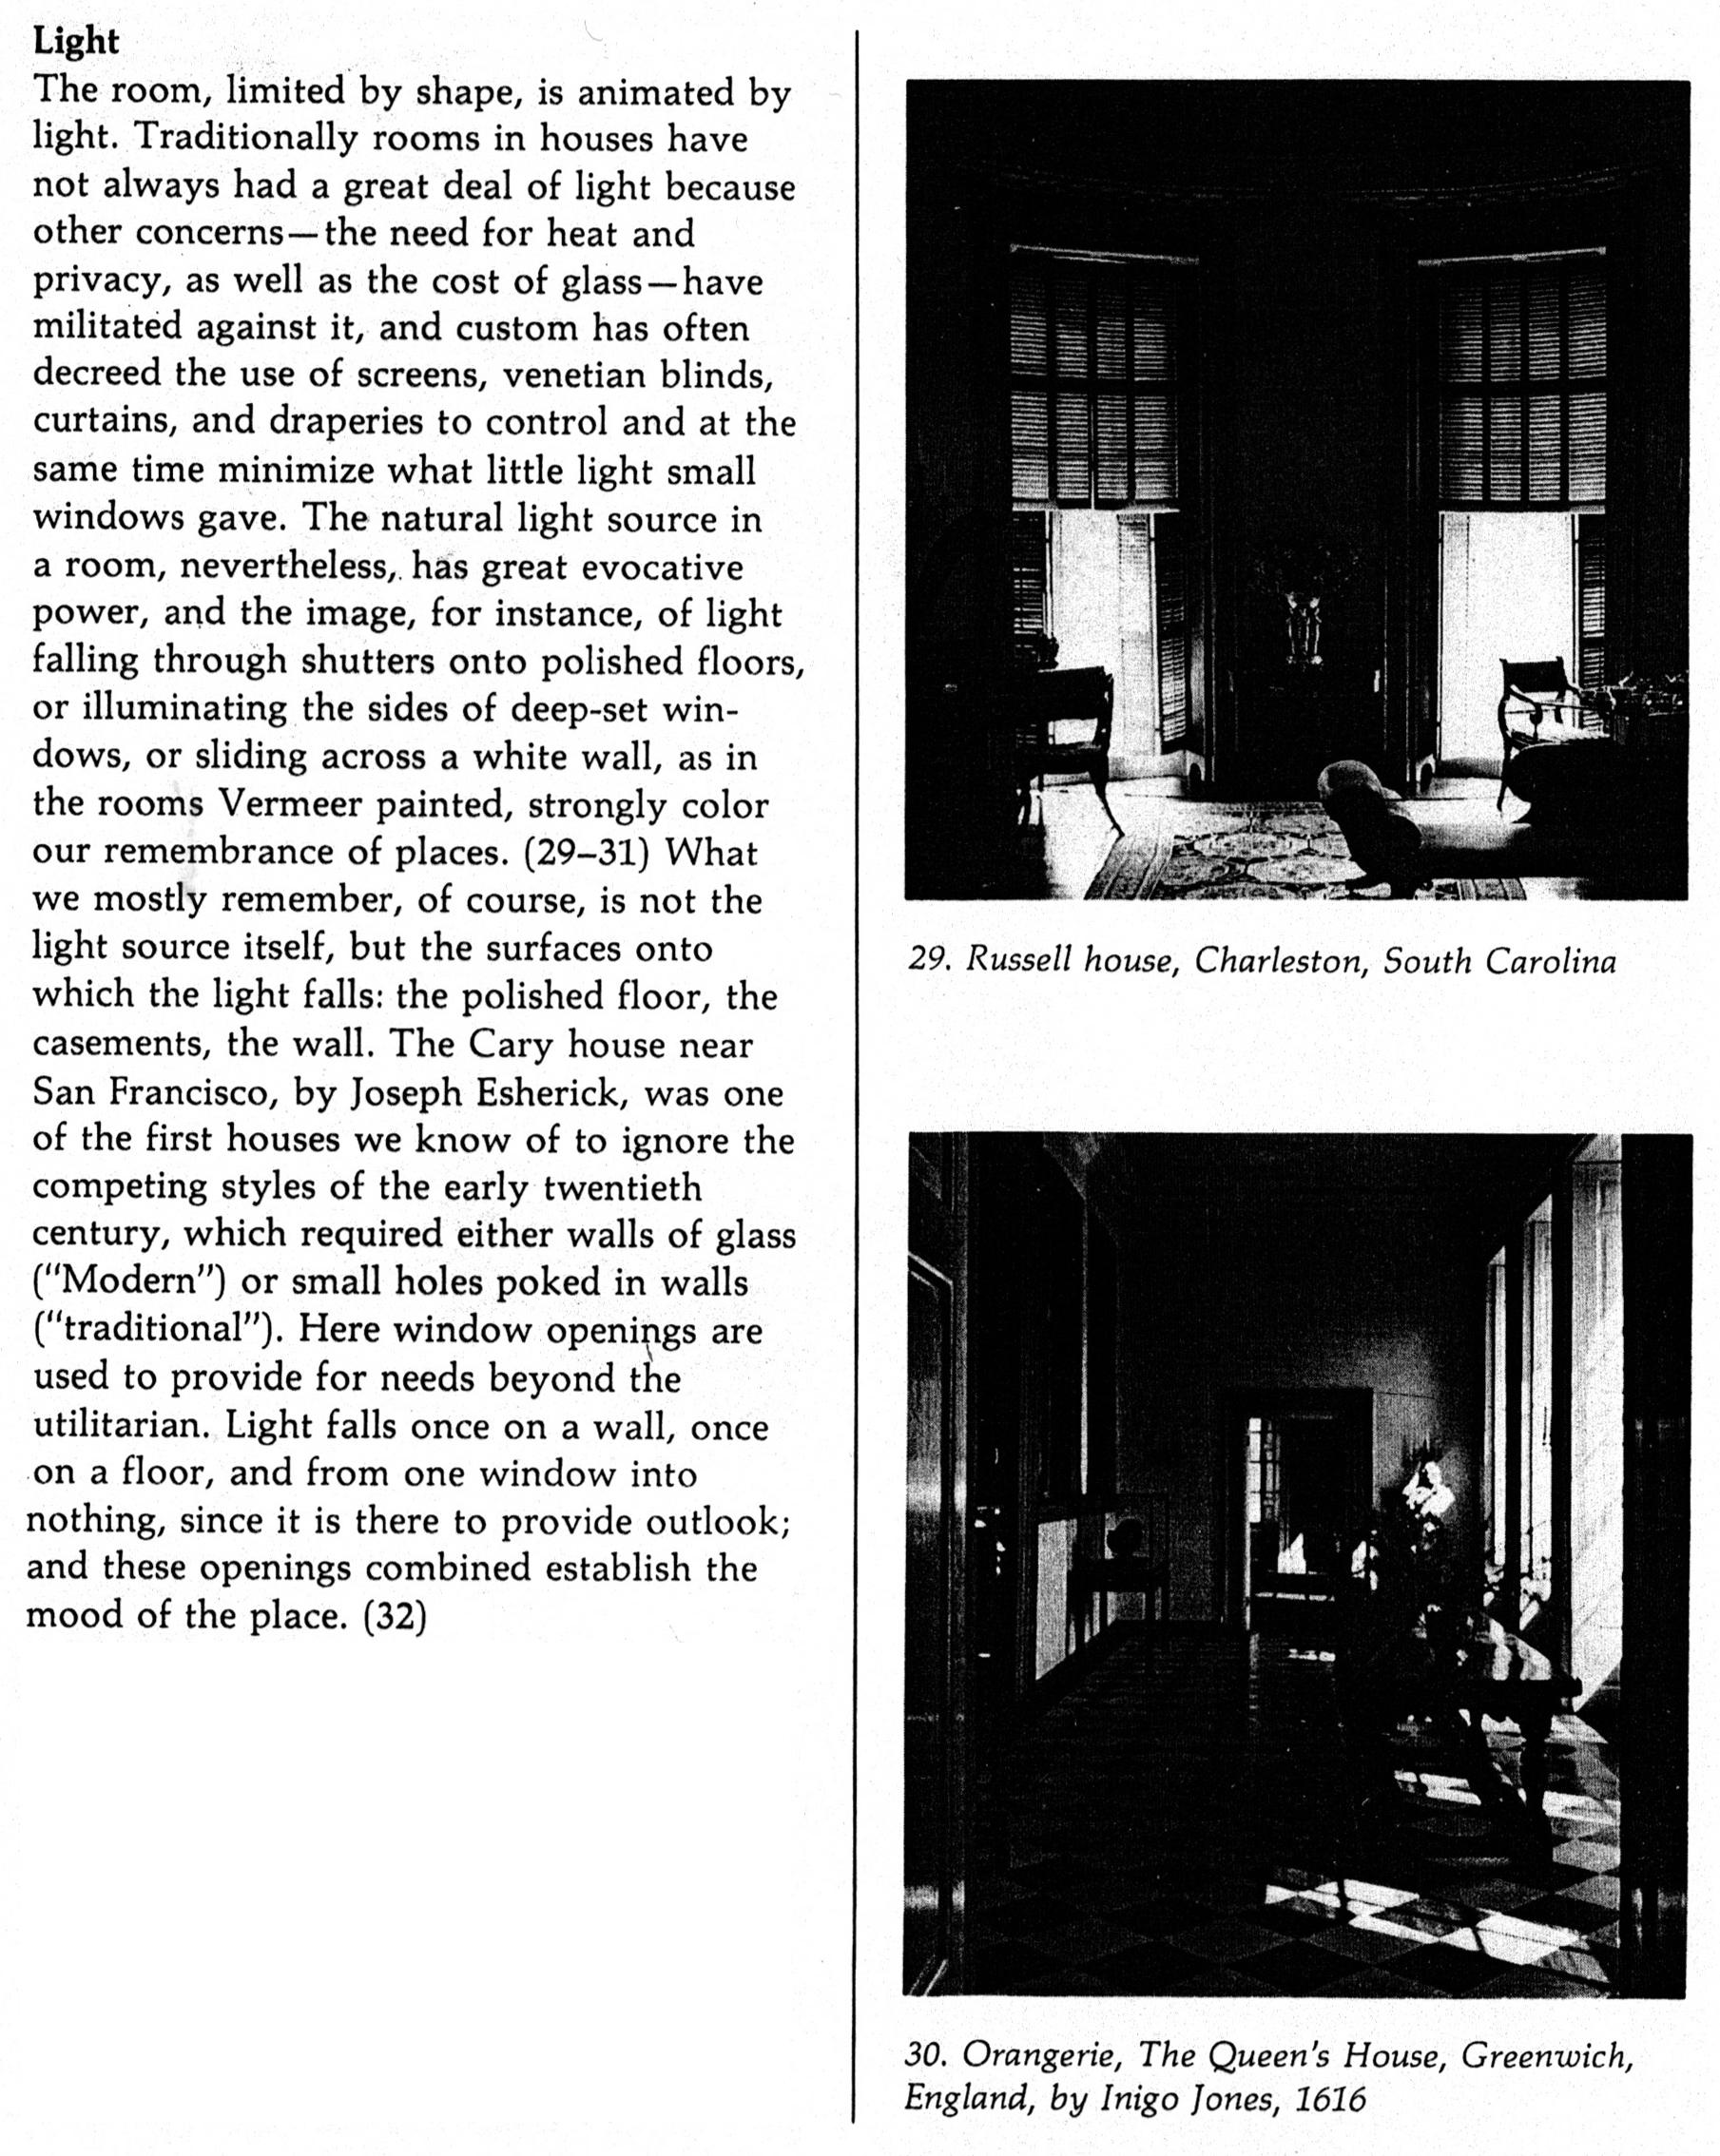 Light1_PlaceOfHouses_p96-1.jpg